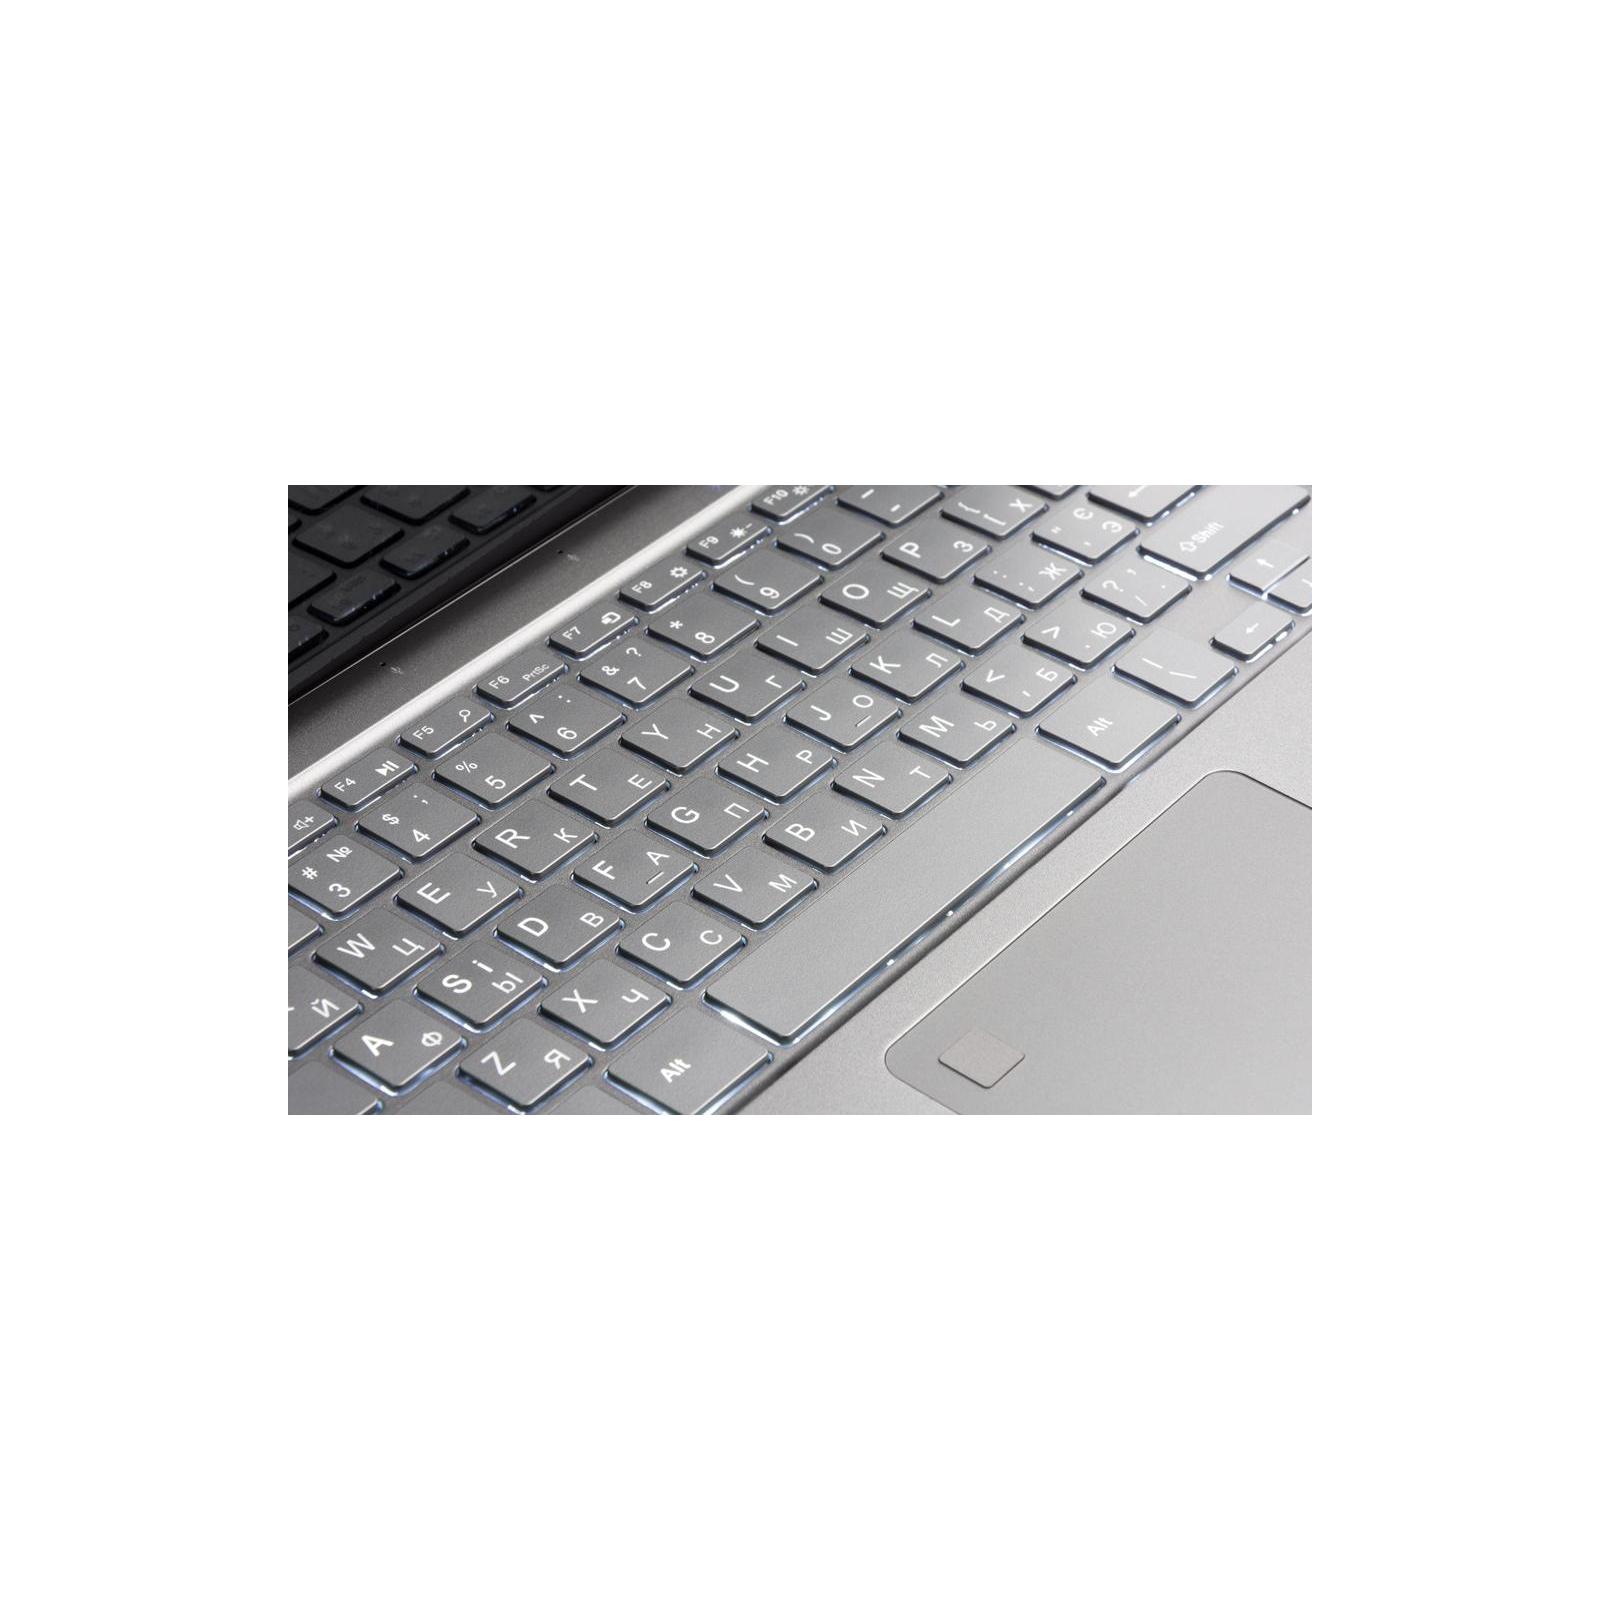 Ноутбук Vinga Twizzle Pen J133 (J133-C33464PS) изображение 8